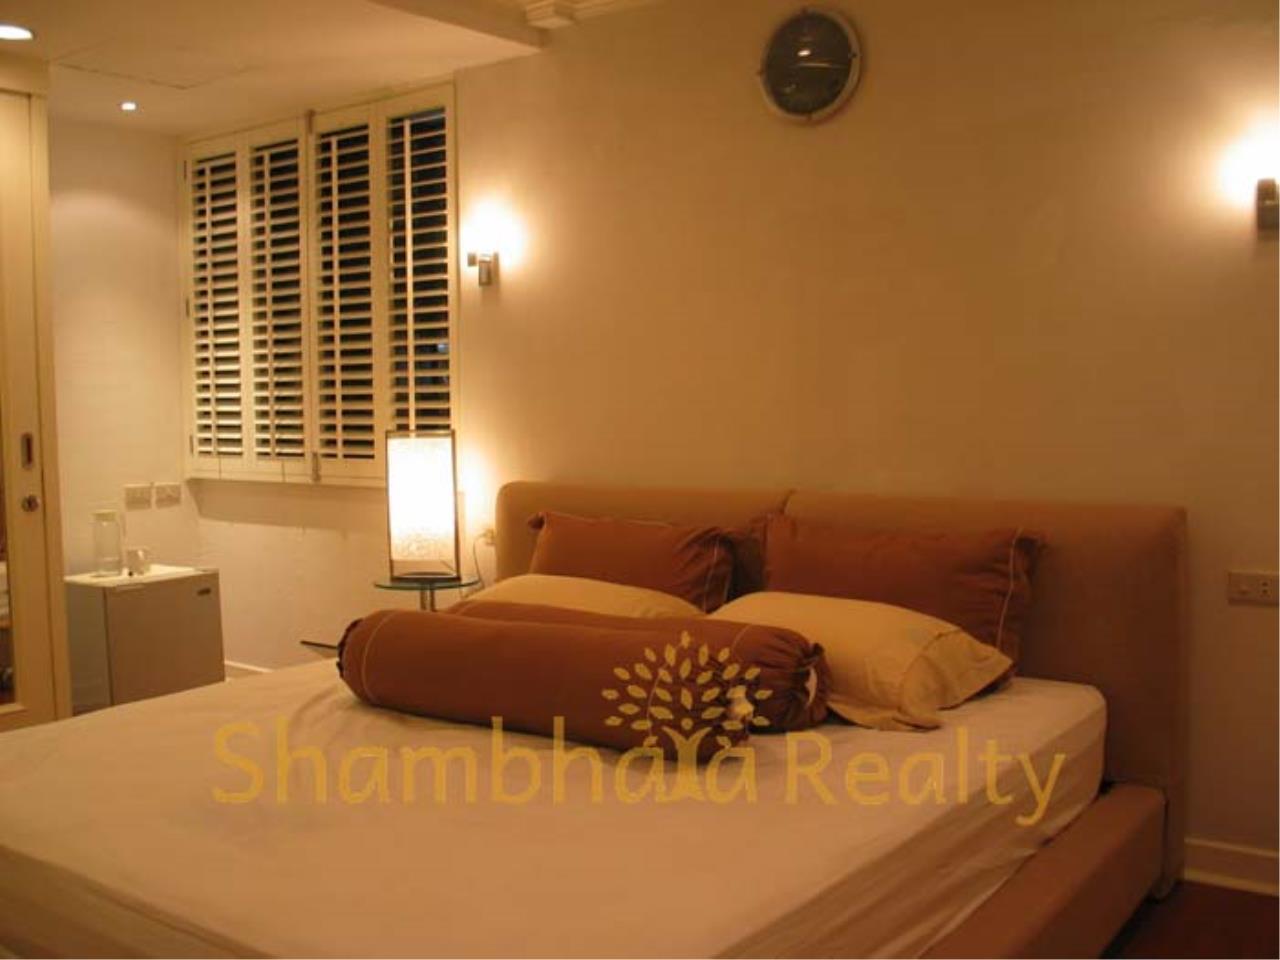 Shambhala Realty Agency's Kiat Thani Condominium for Sale in sukhumvit 31 17